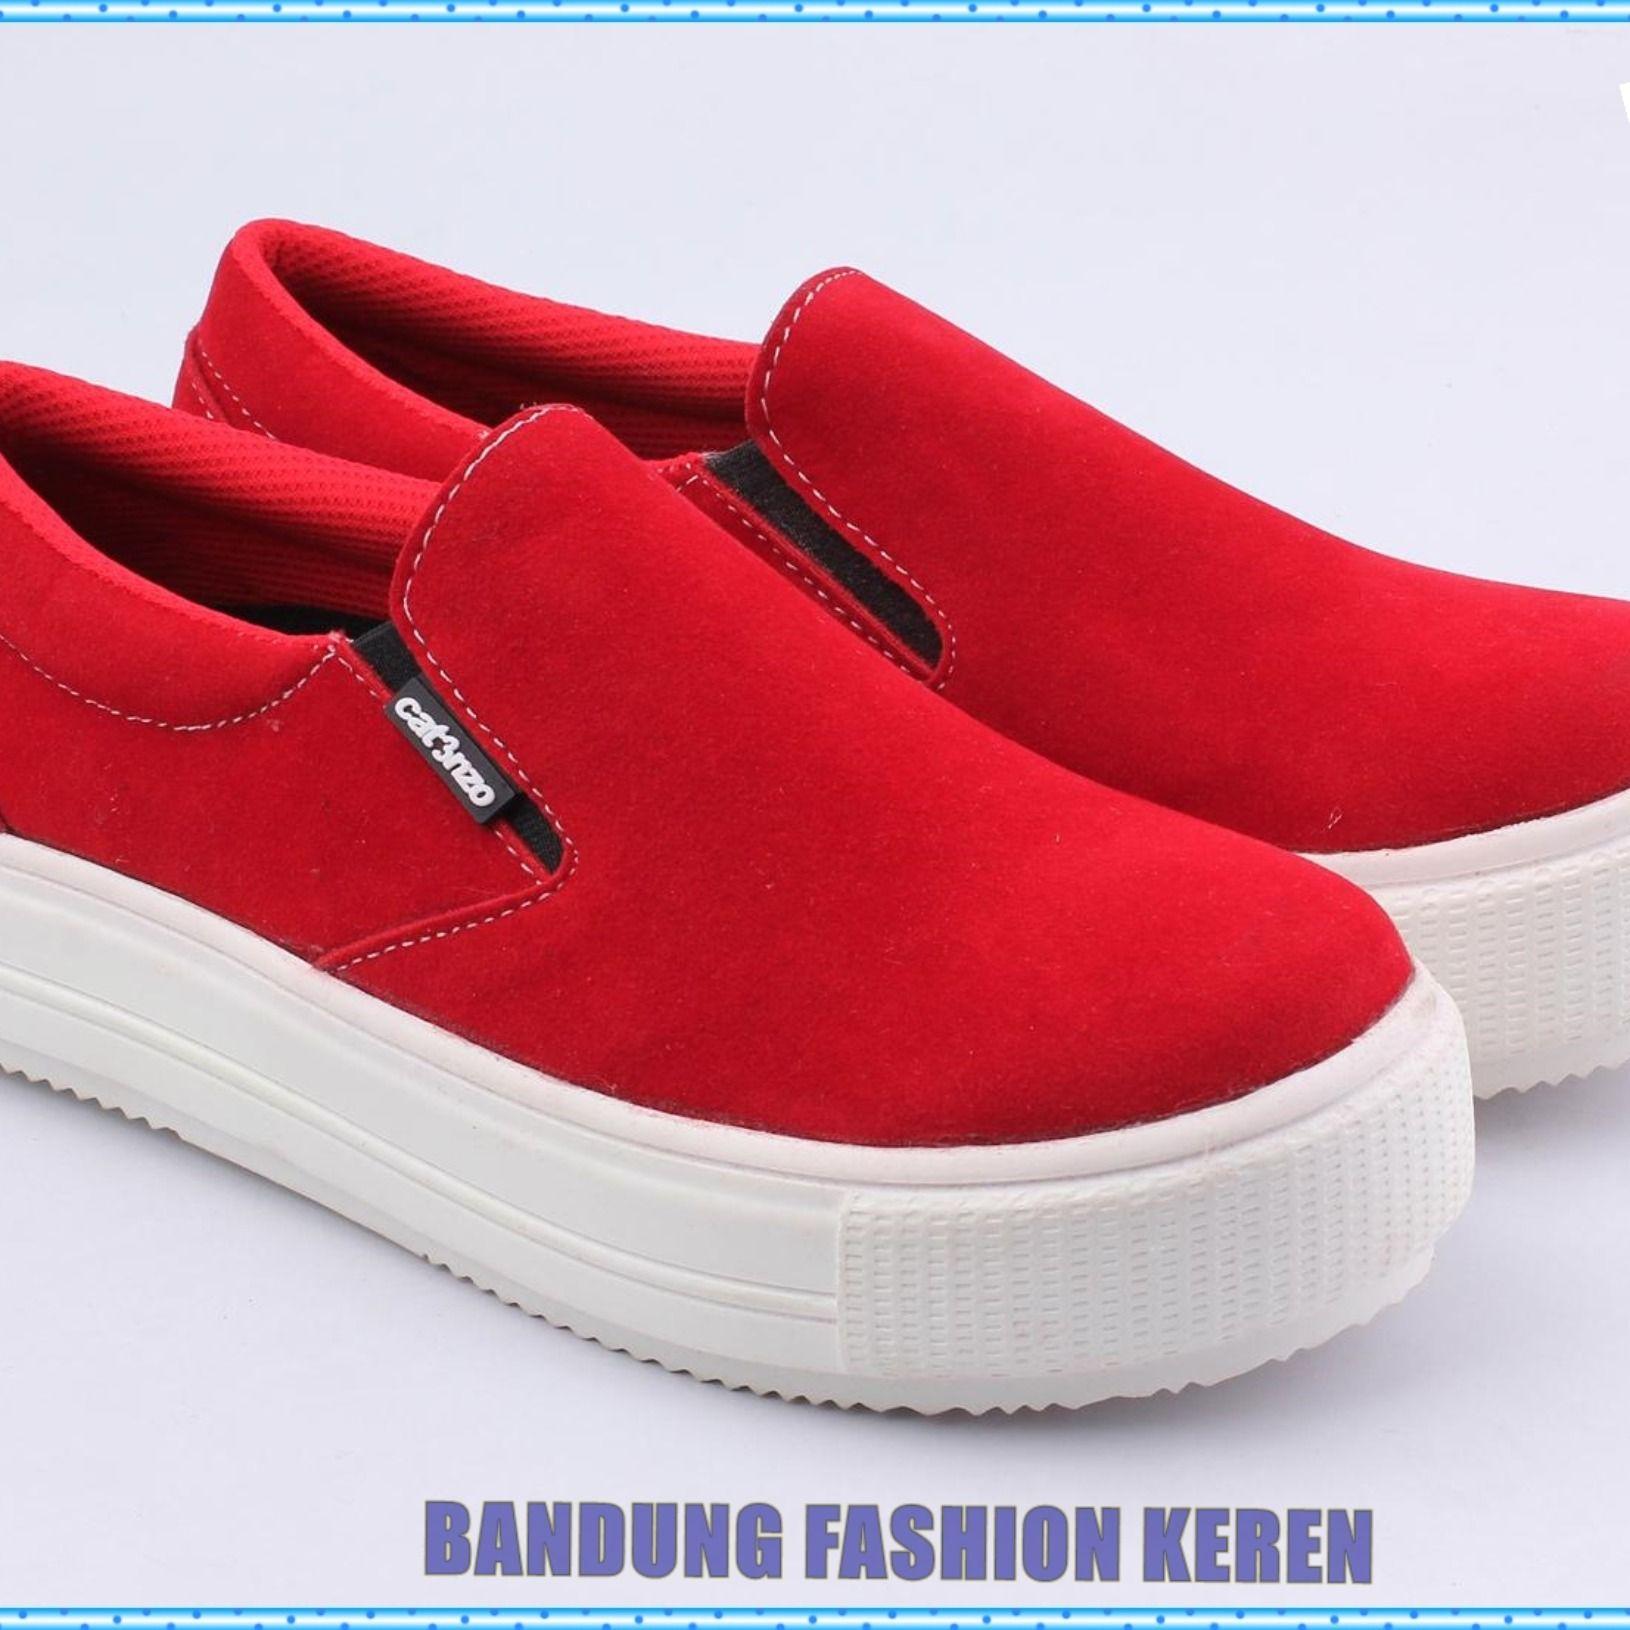 Sepatu Casual Wanita Mr 764 Produk Fashion Handmade Terbaik 100